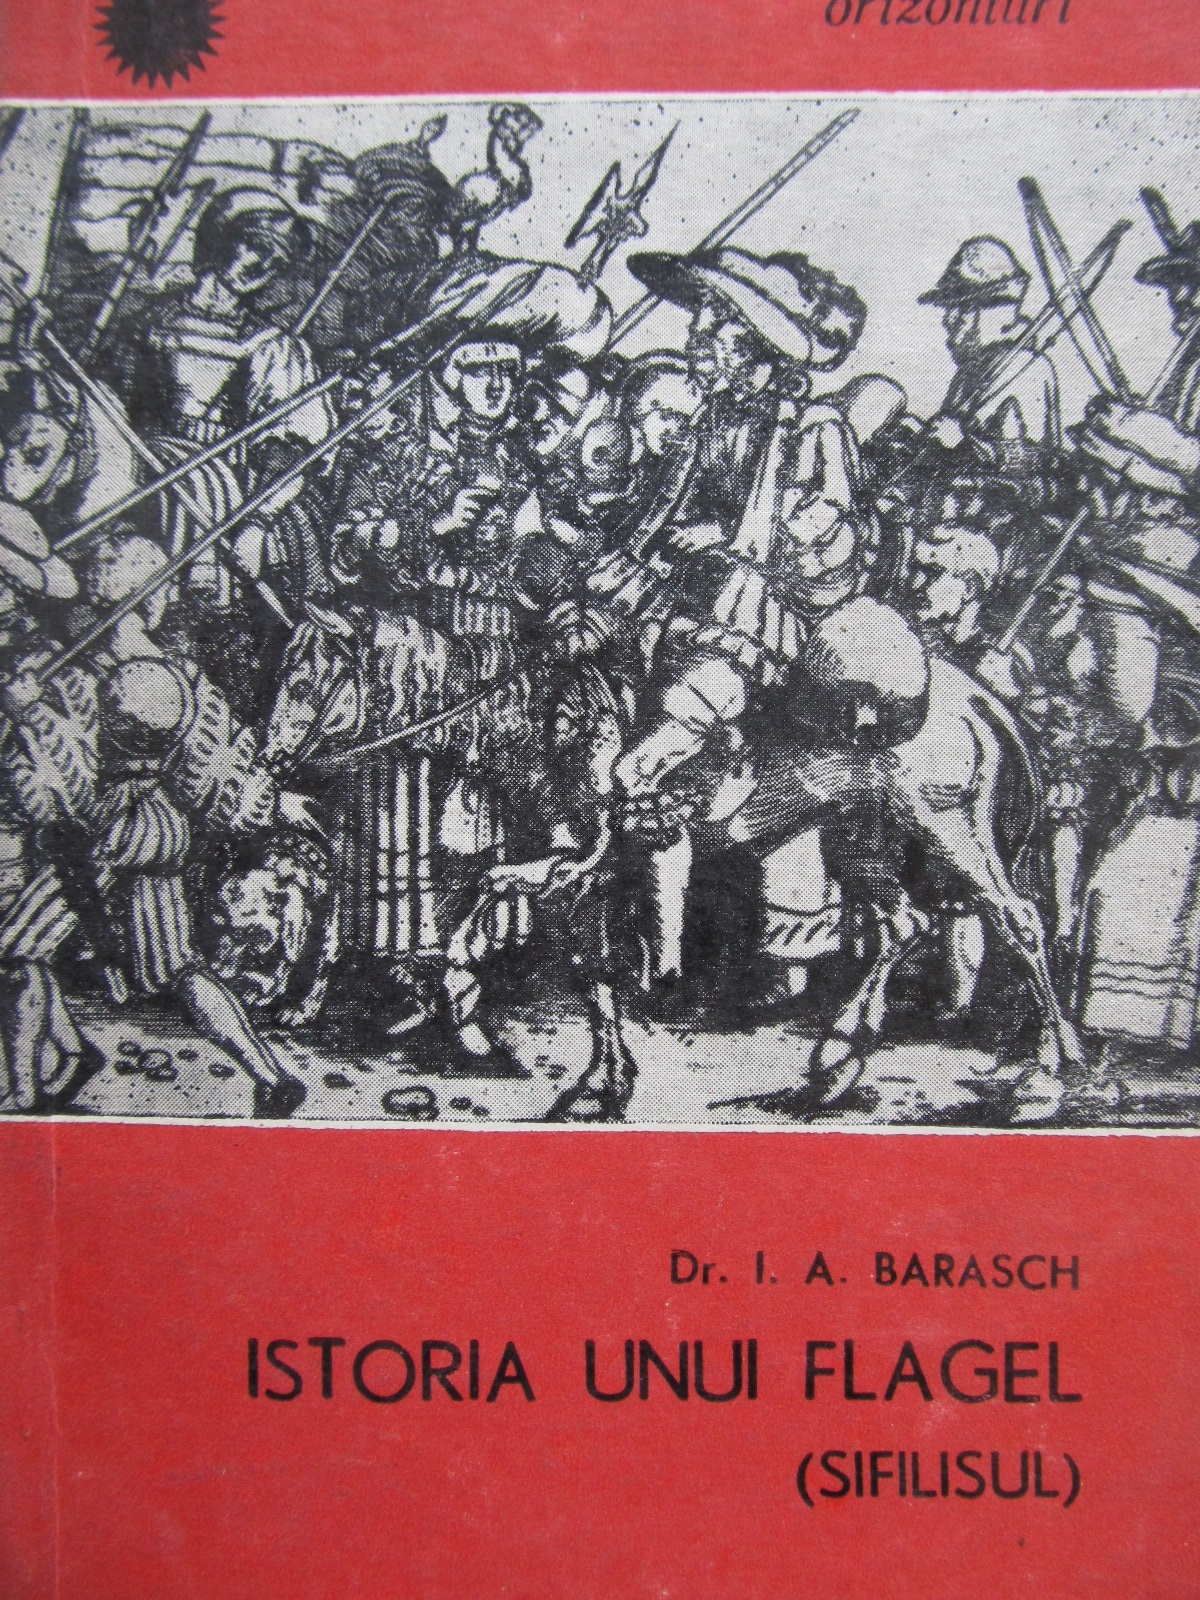 Istoria unui flagel (sifilisul) - I. A. Barasch | Detalii carte